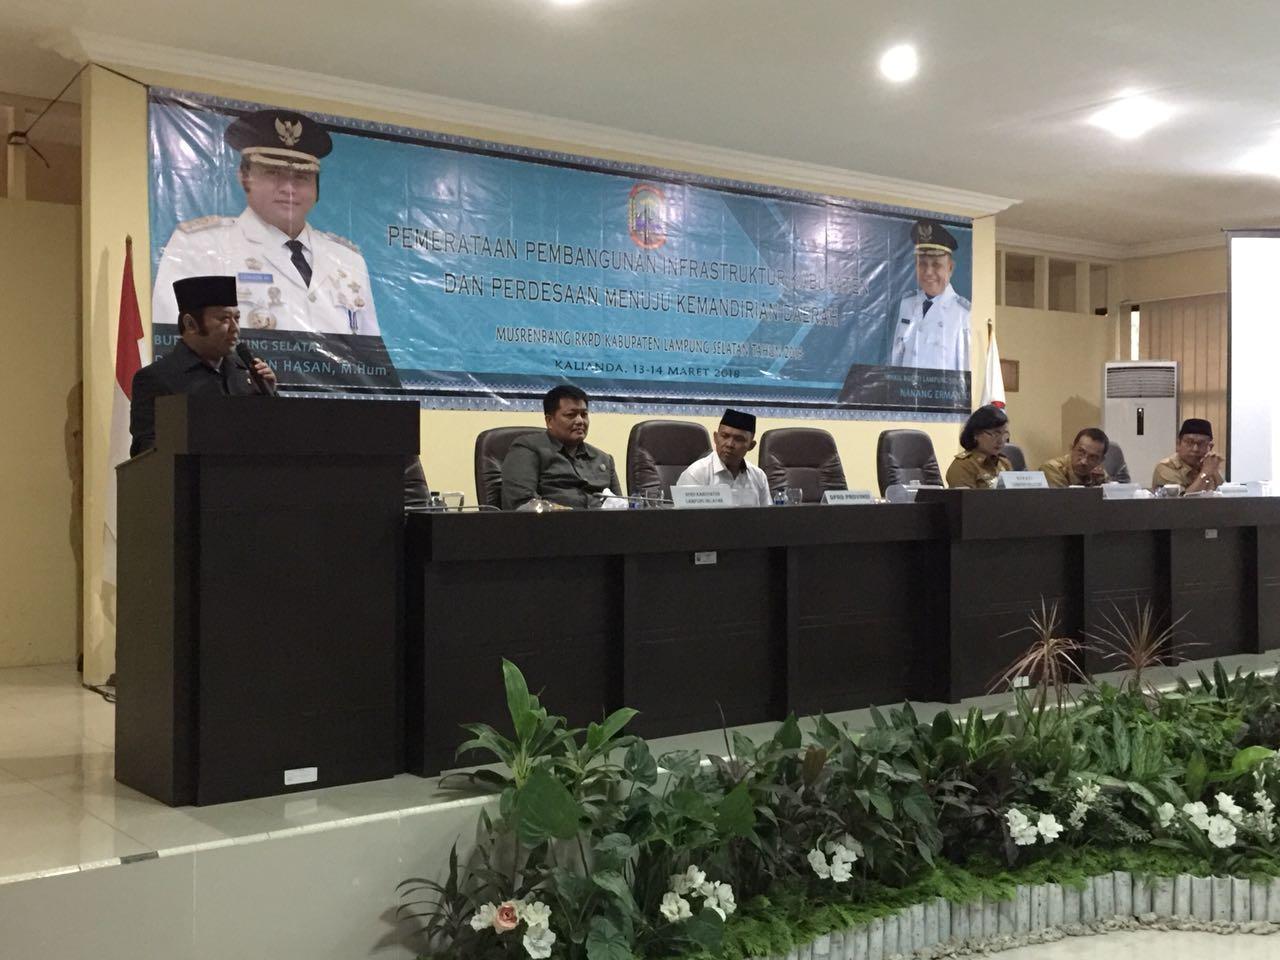 Pemkab Lamsel Usulkan Dana Rp556 Miliar Melalui APBD Provinsi Lampung